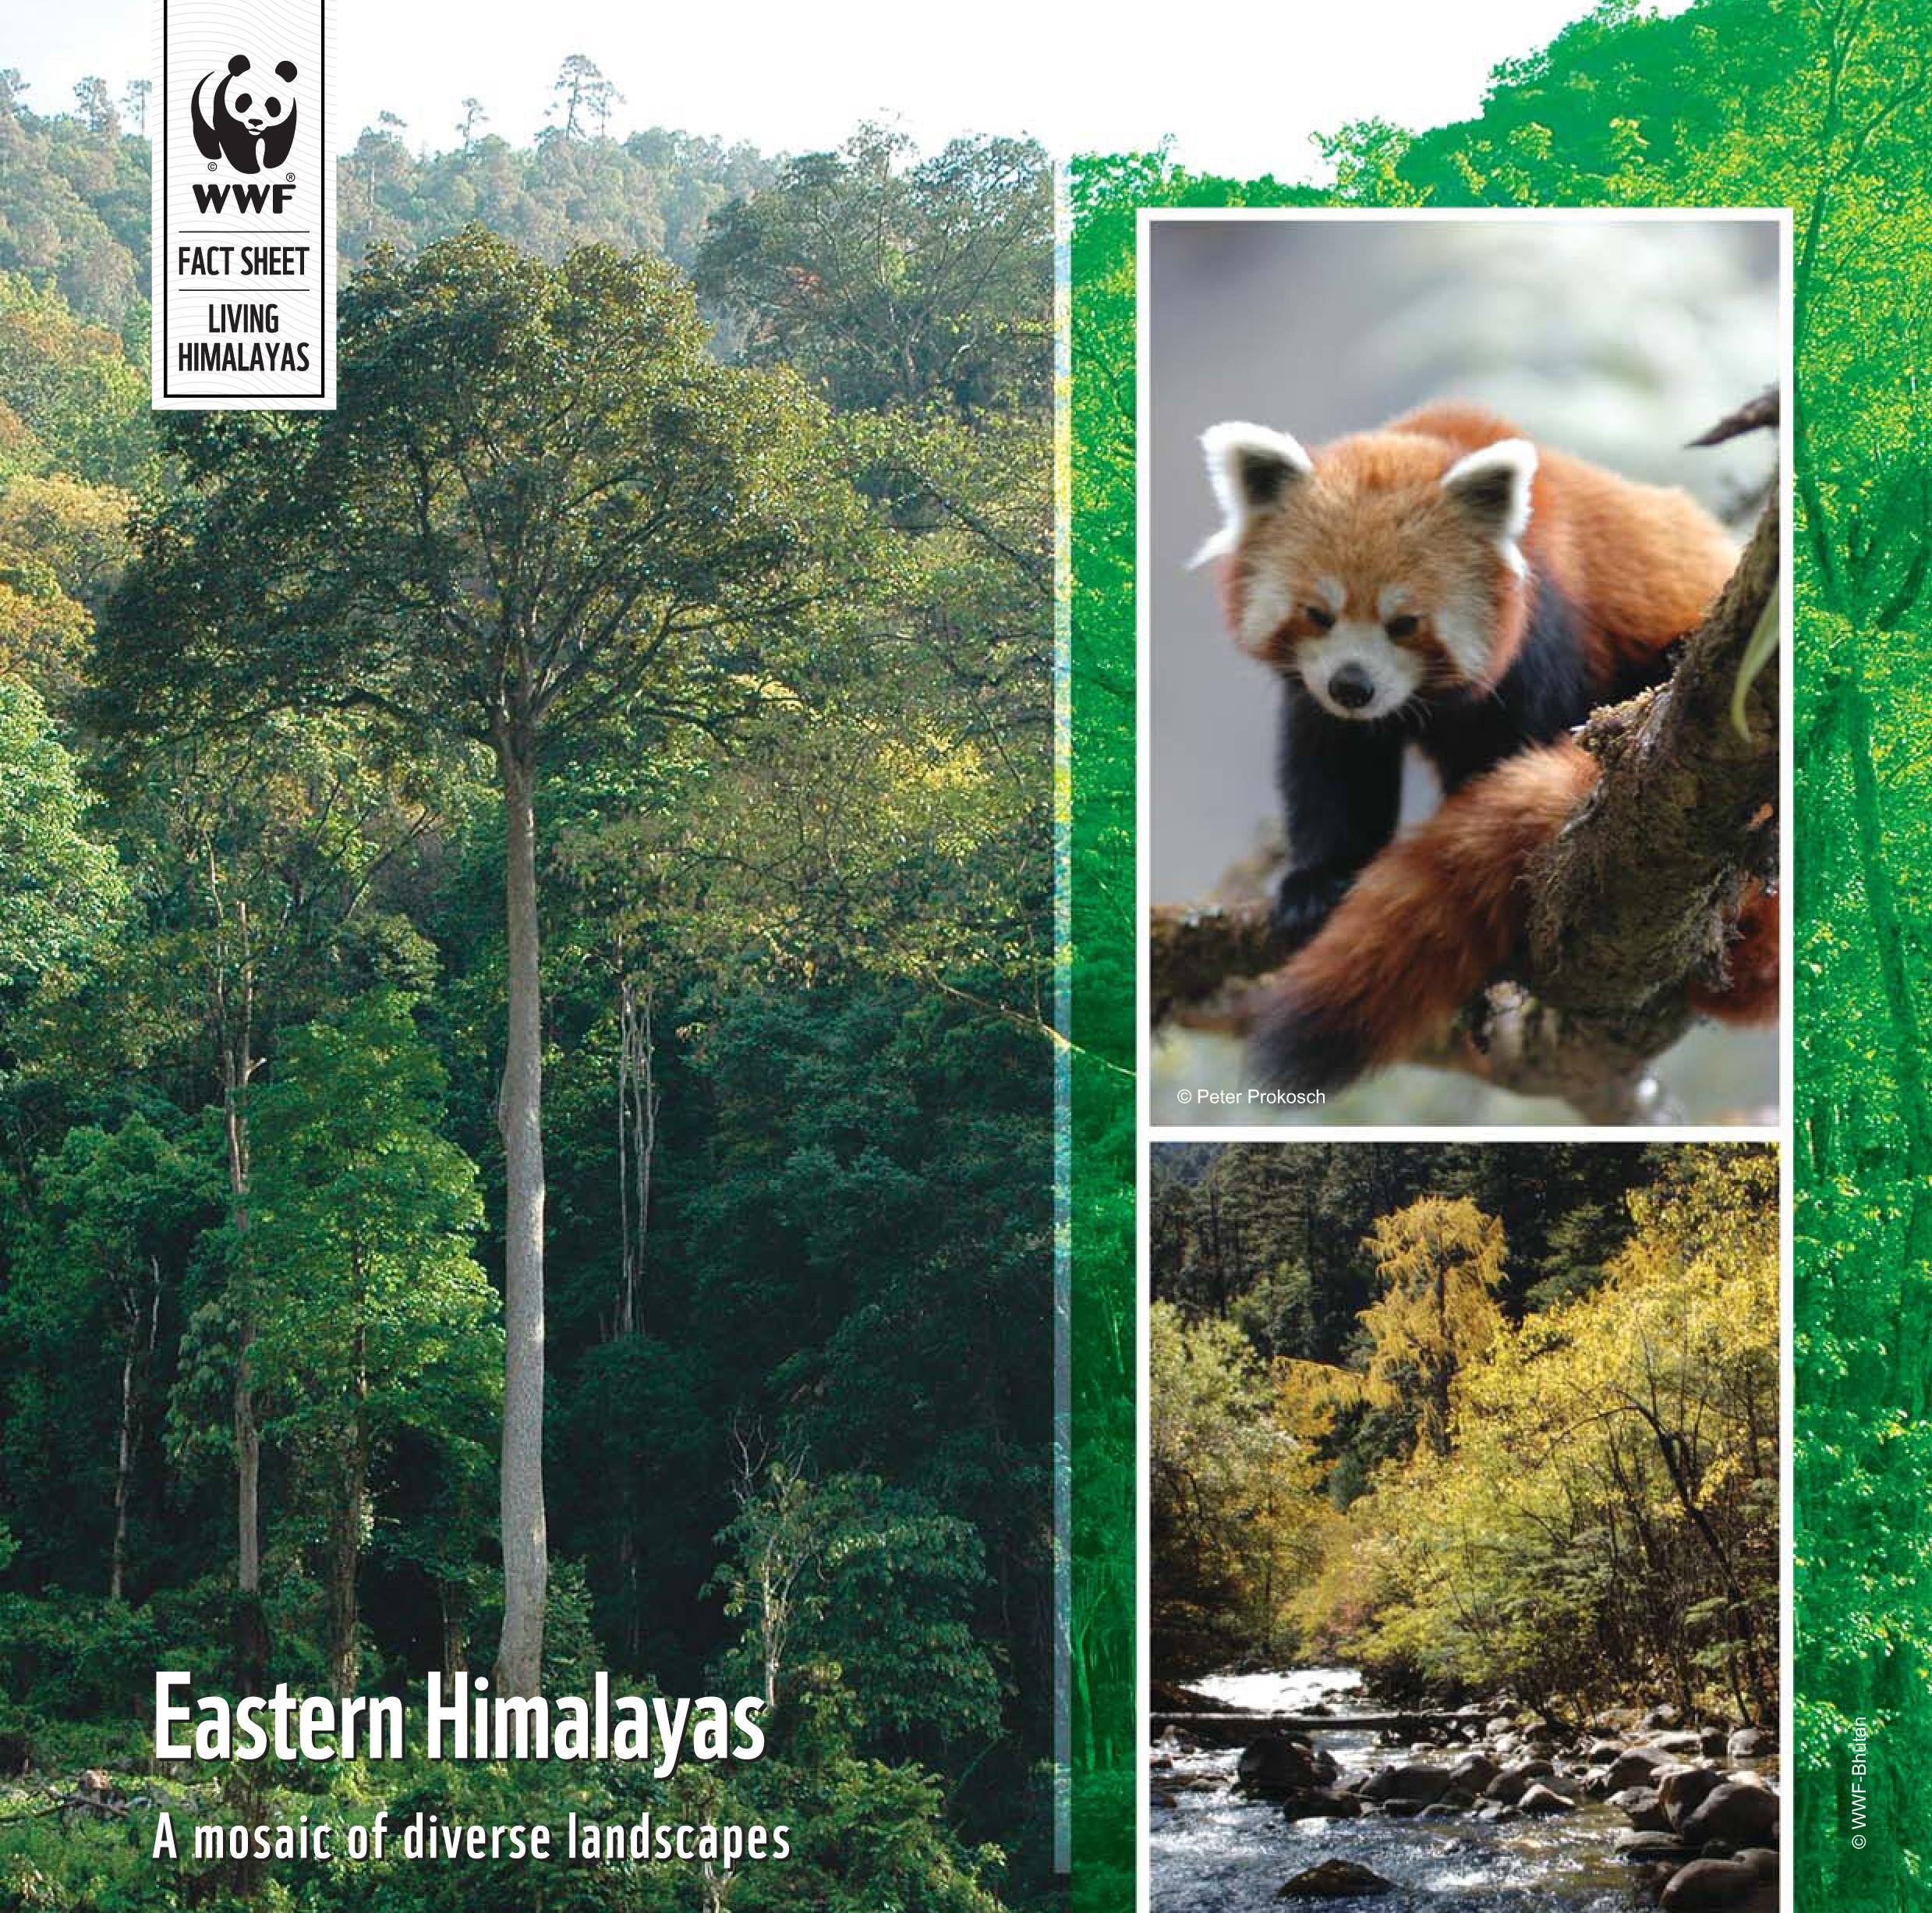 red panda food chain